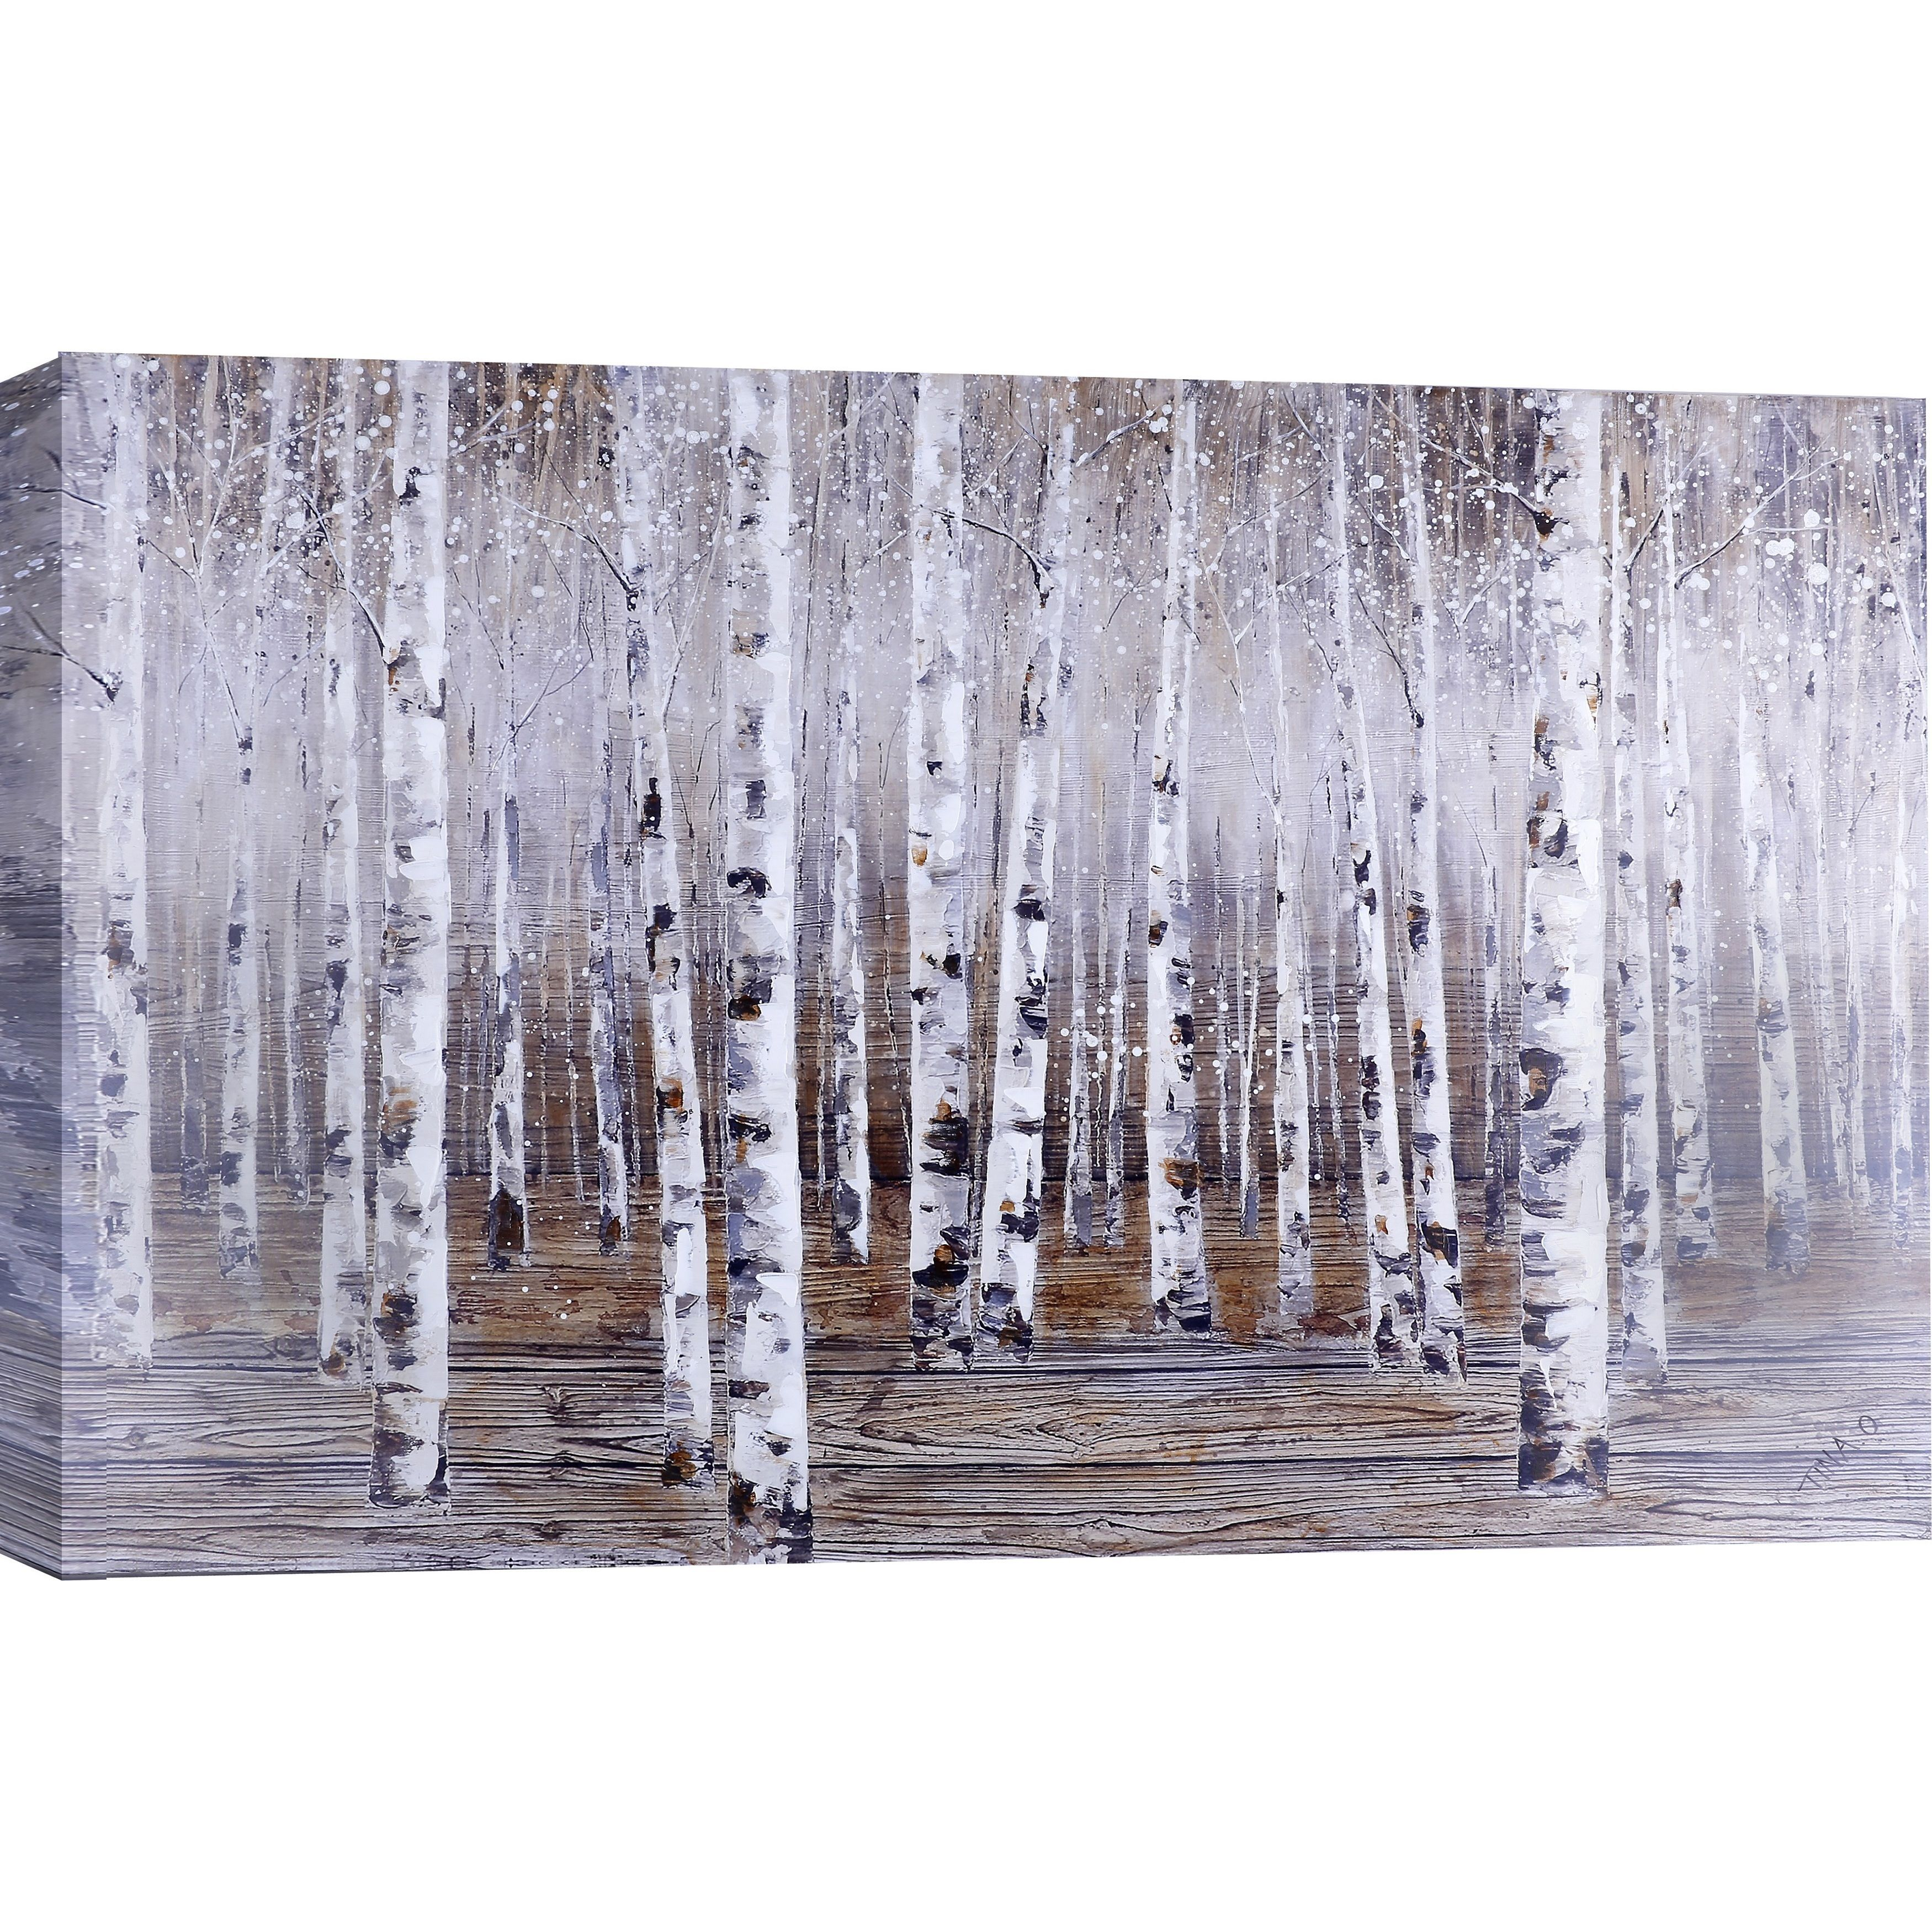 40-inch x 60-inch Acrylic Painting